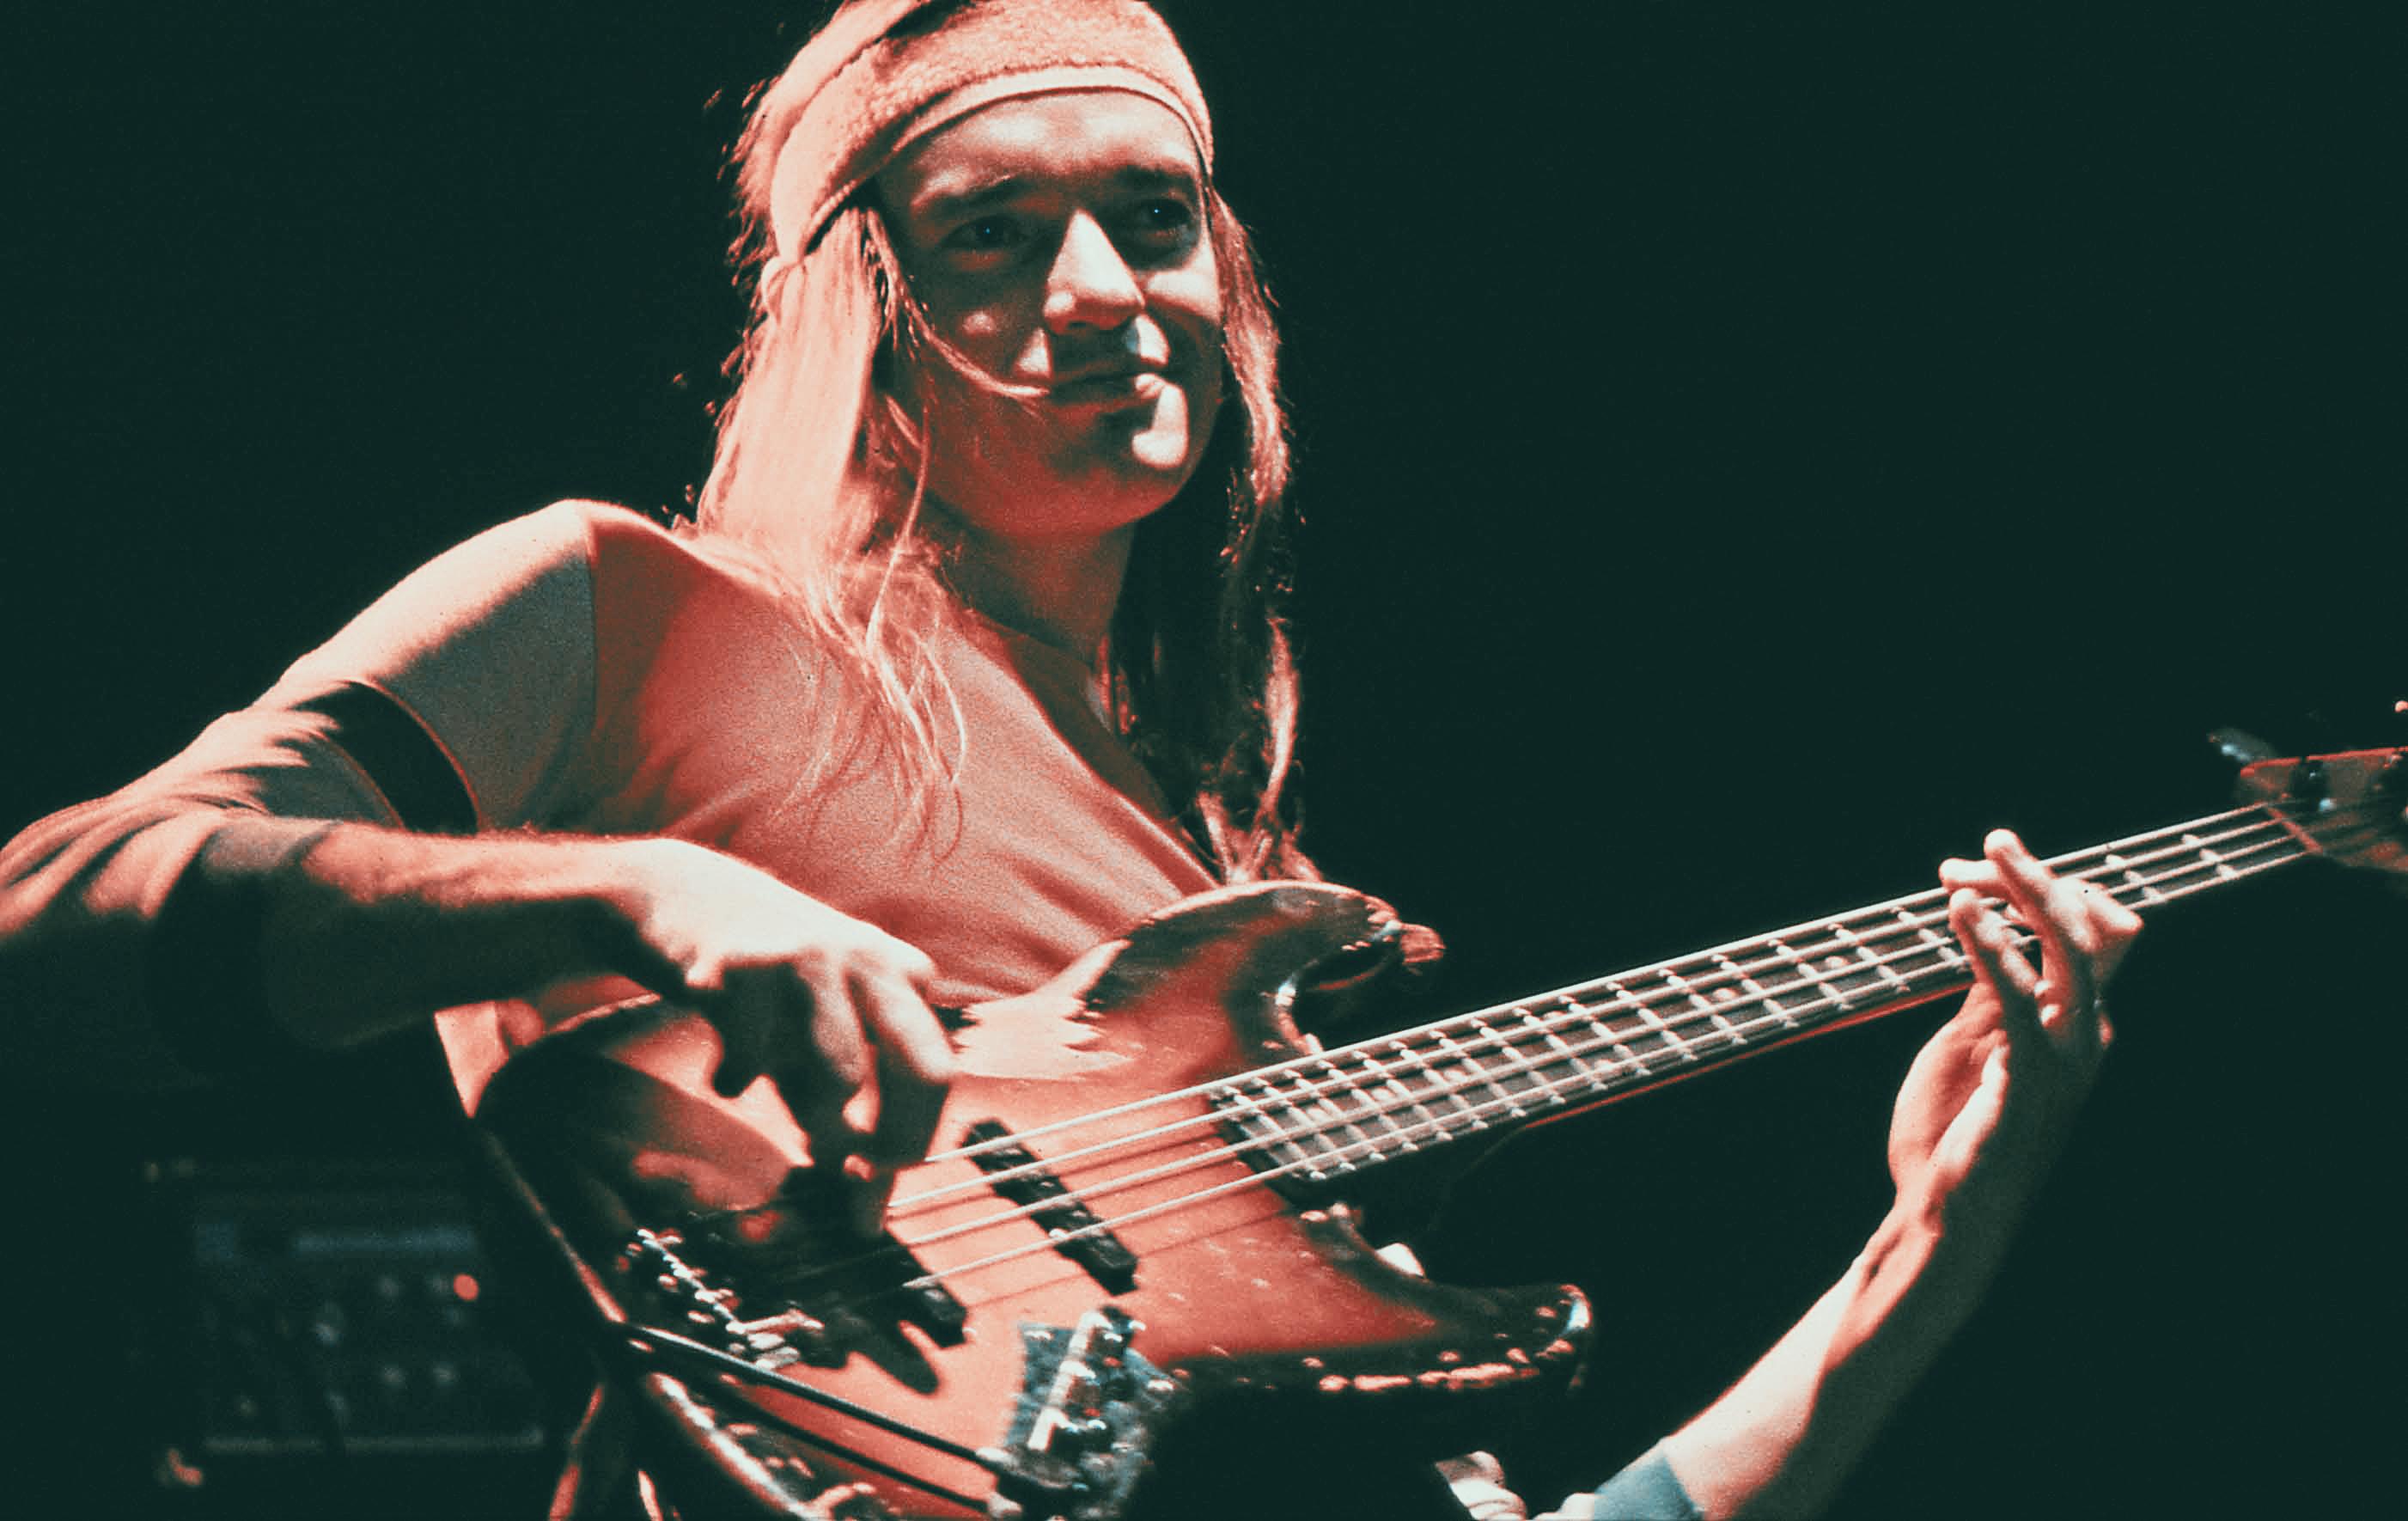 Jaco Pastorius, bassist extraordinaire